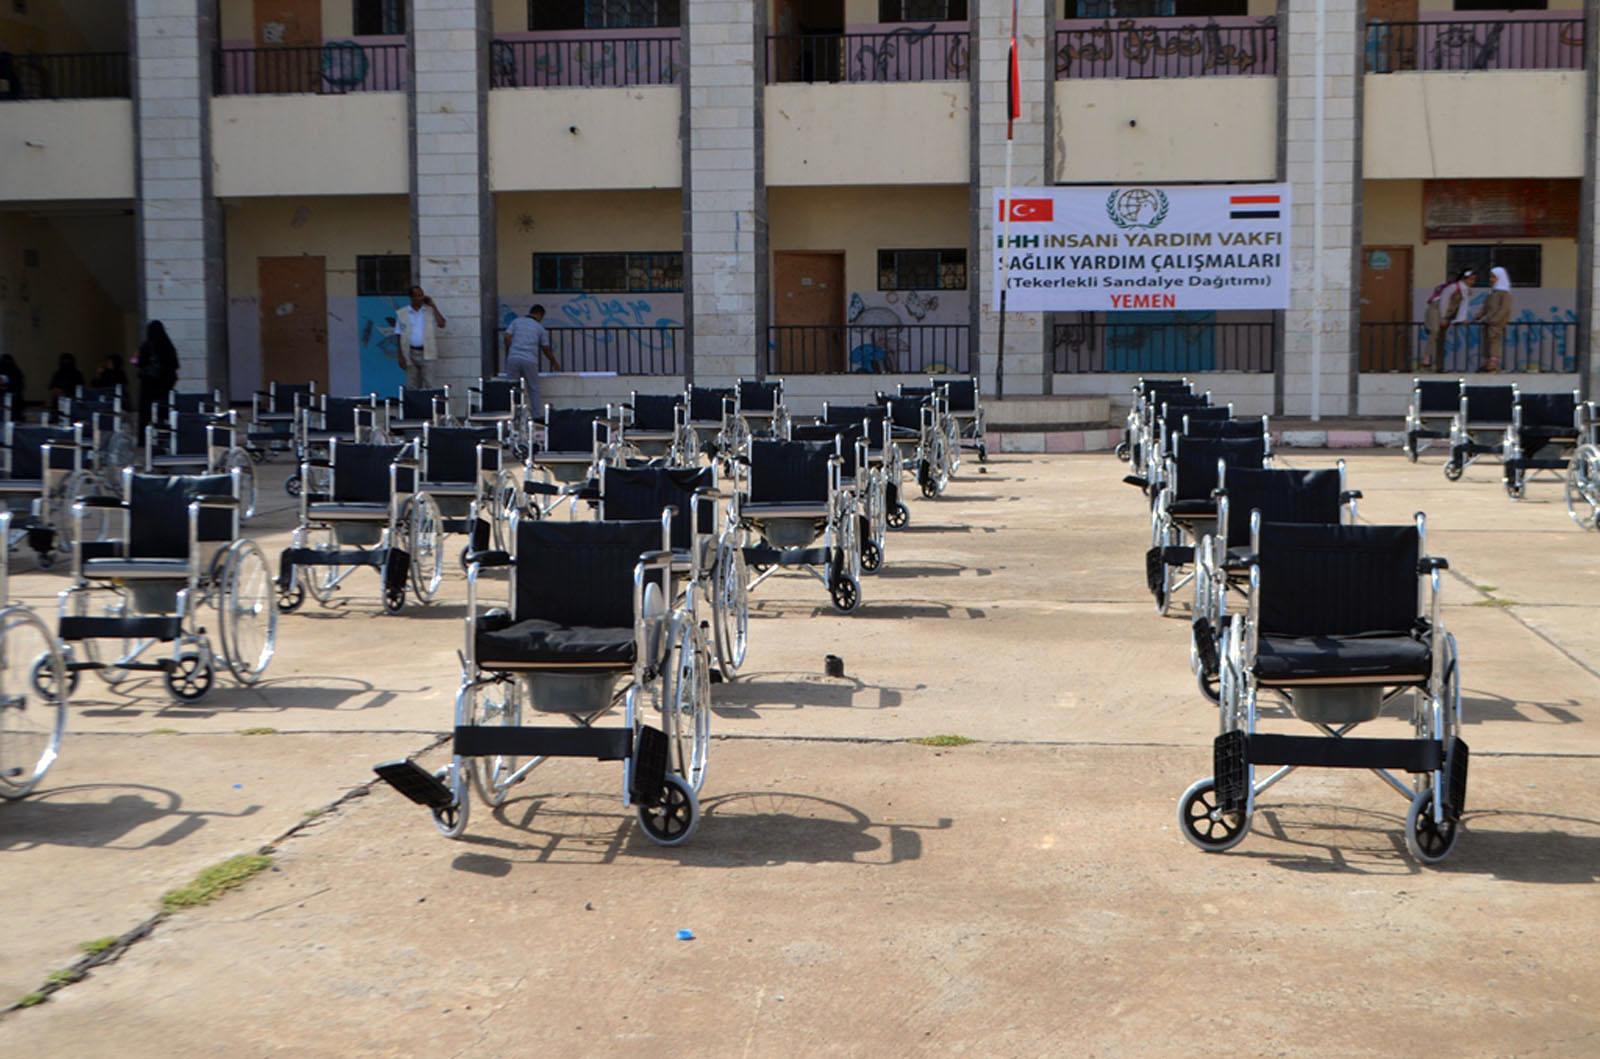 Yemen E 11 Saglik Merkezi Ihh Insani Yardim Vakfi